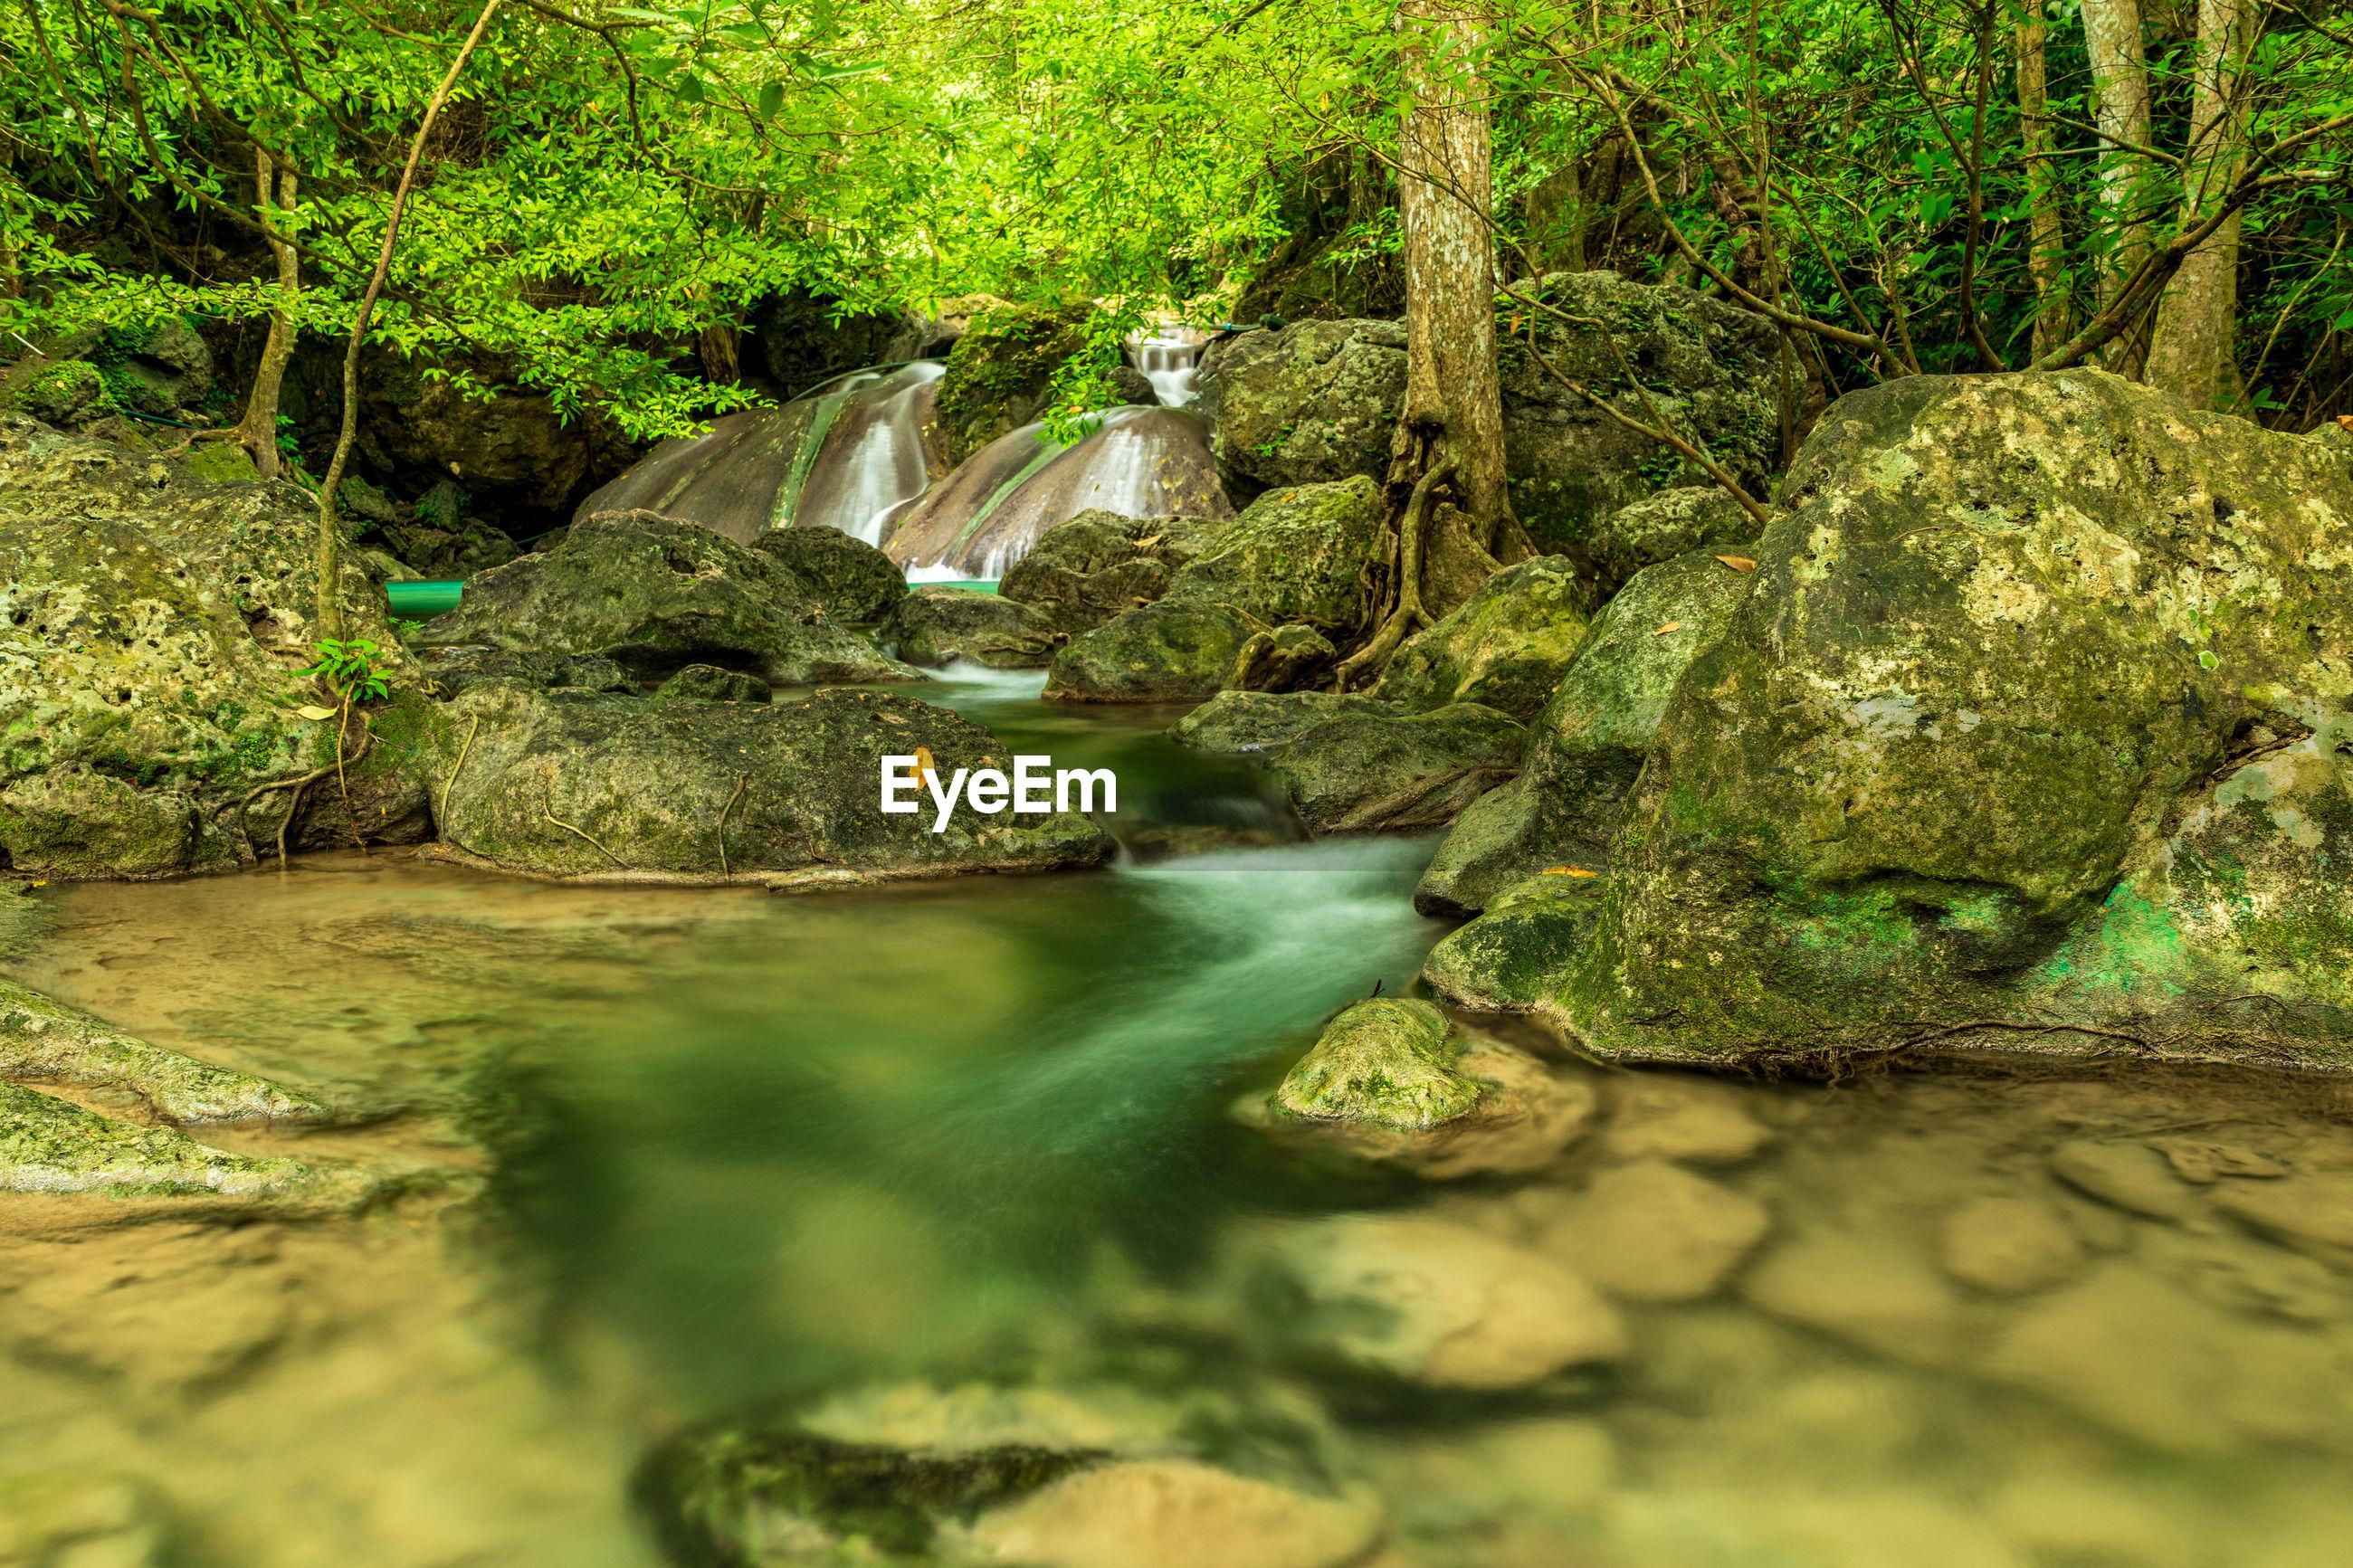 Erawan waterfall in rain forest at national park,thailand.